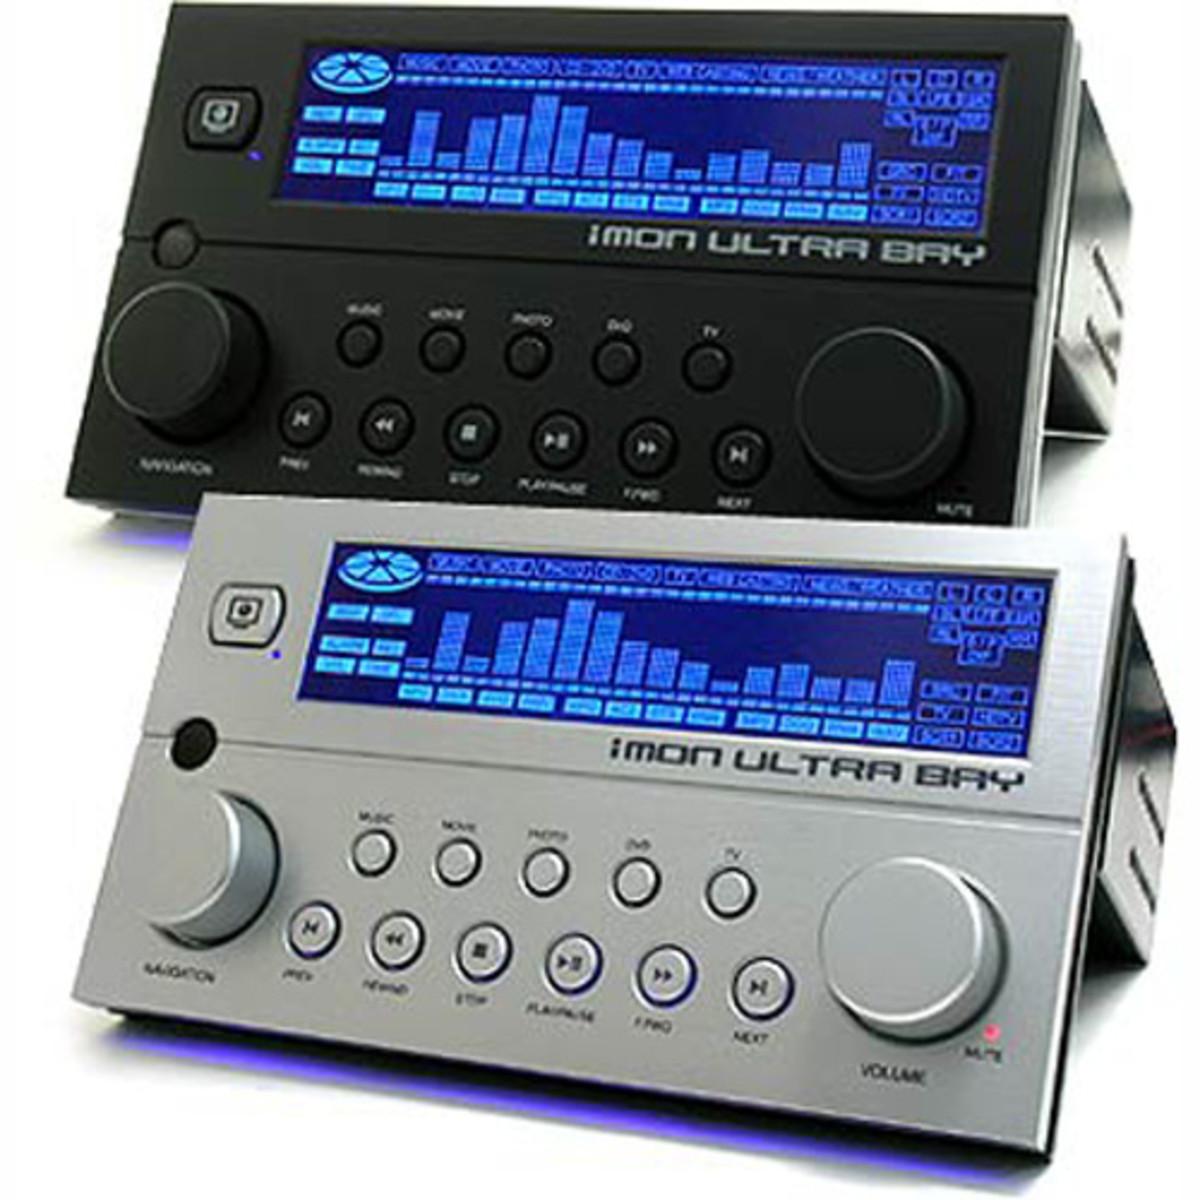 SOUNDGRAPH IMON DRIVERS FOR MAC